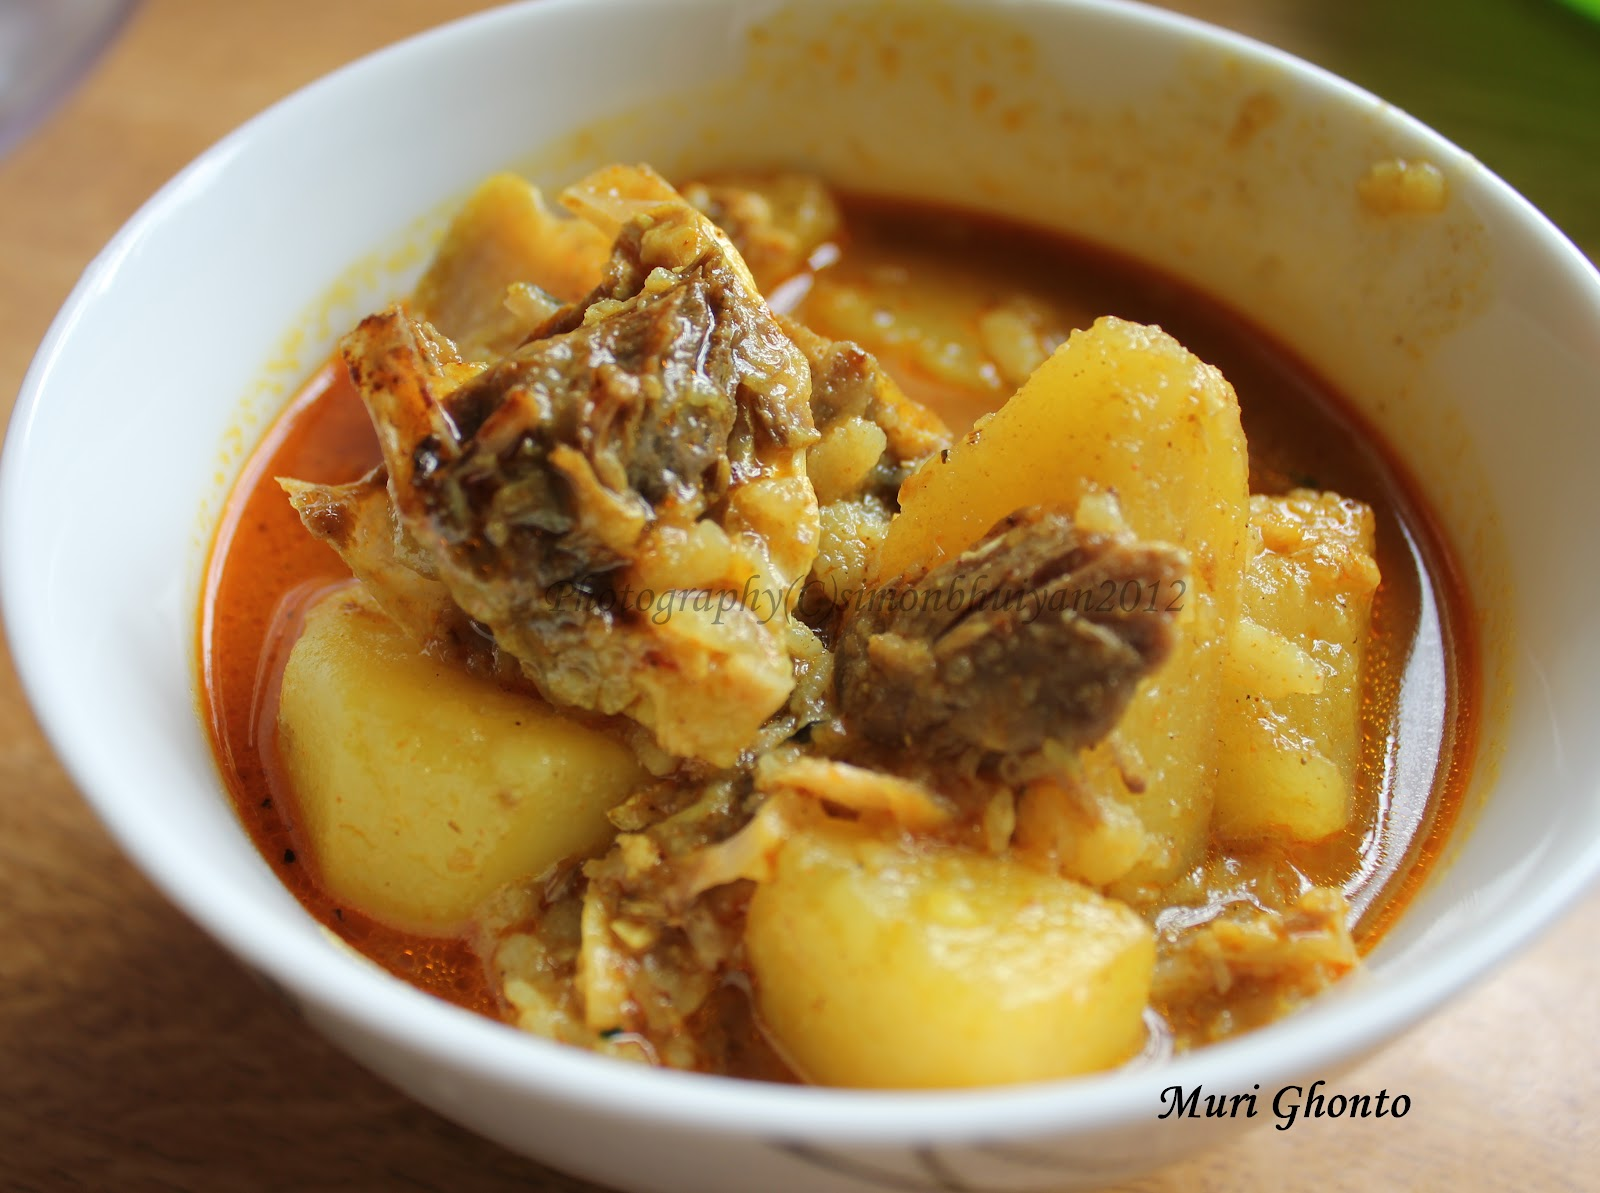 Muri Ghonto-Noakhali Style - Fish head and potato curry